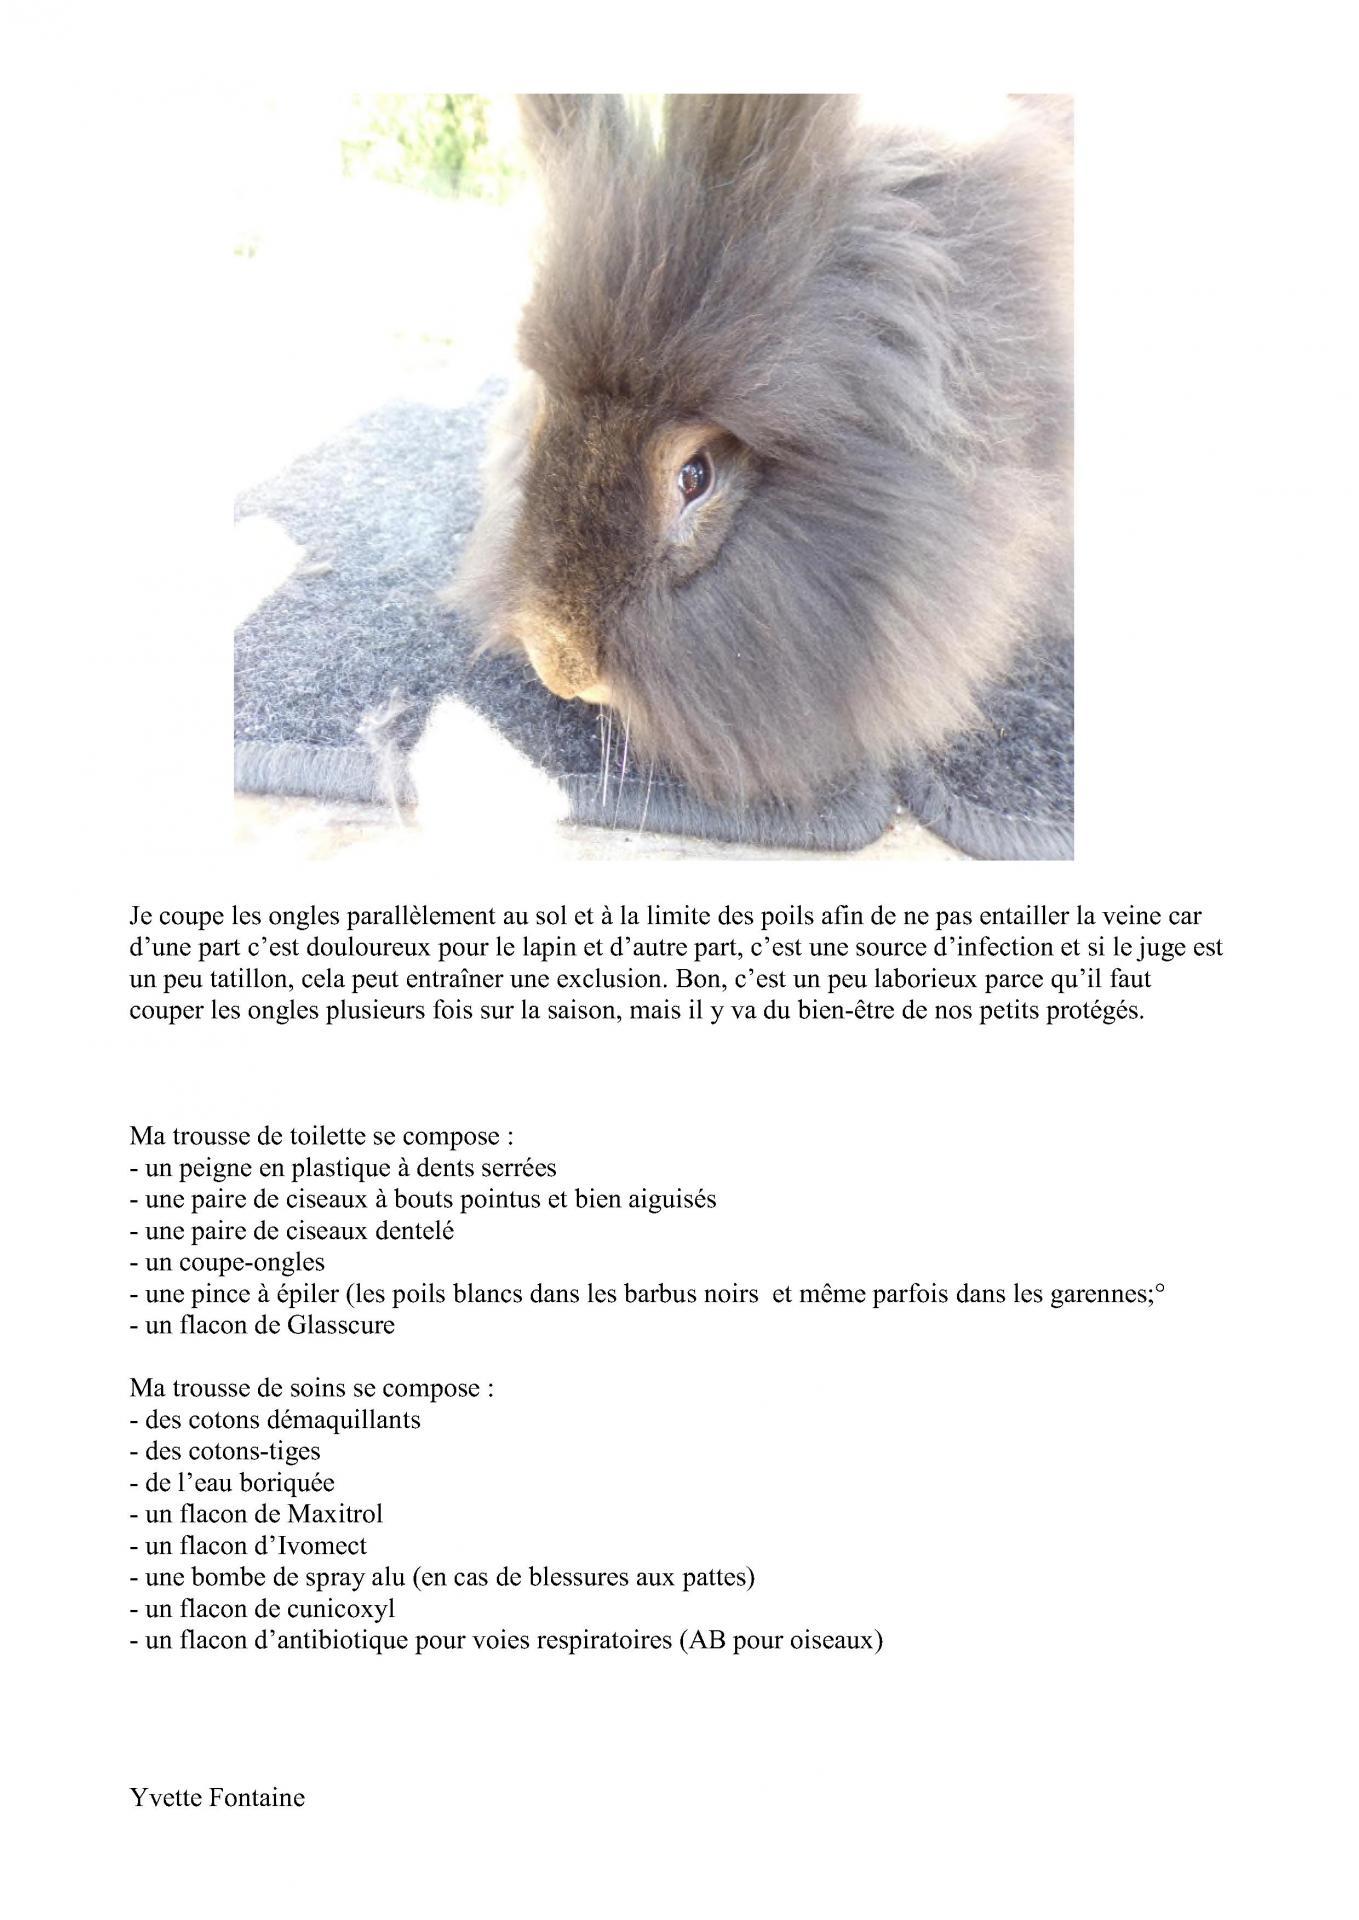 Expose leudon l entretien du barbu 6